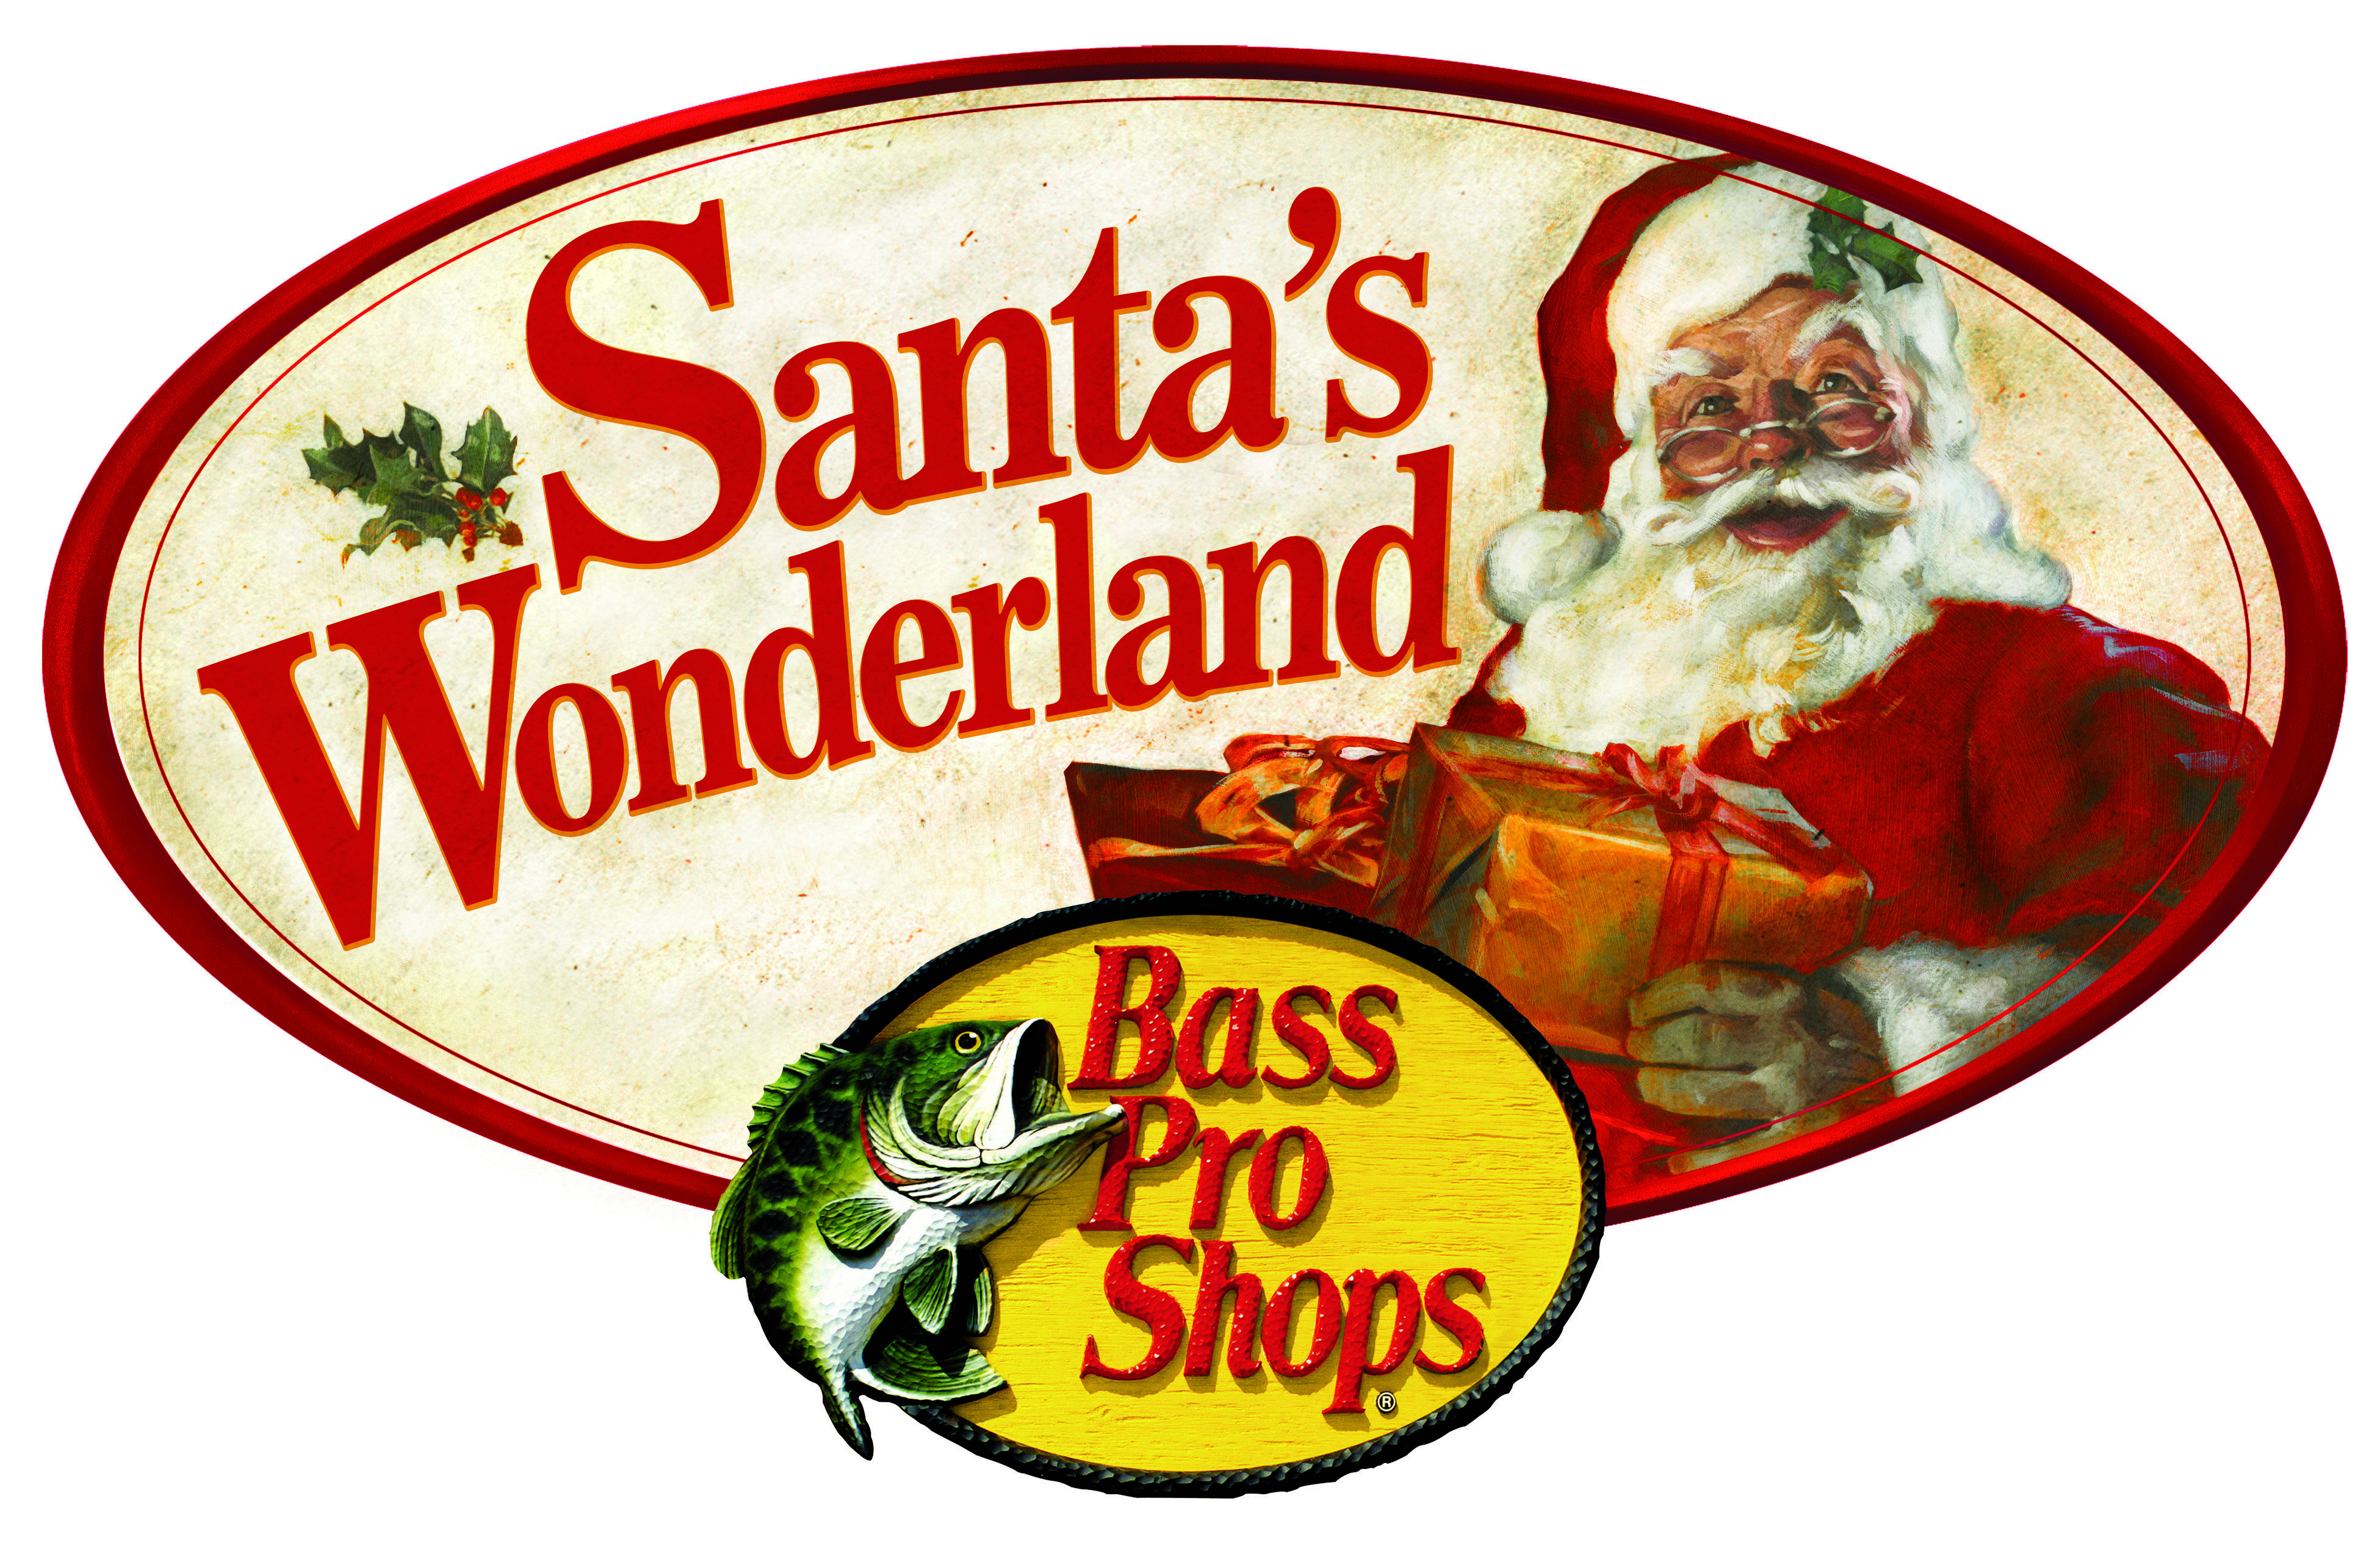 ... color and do fun crafts at Bass Pro Shops Santa's Wonderland. Bass Pro